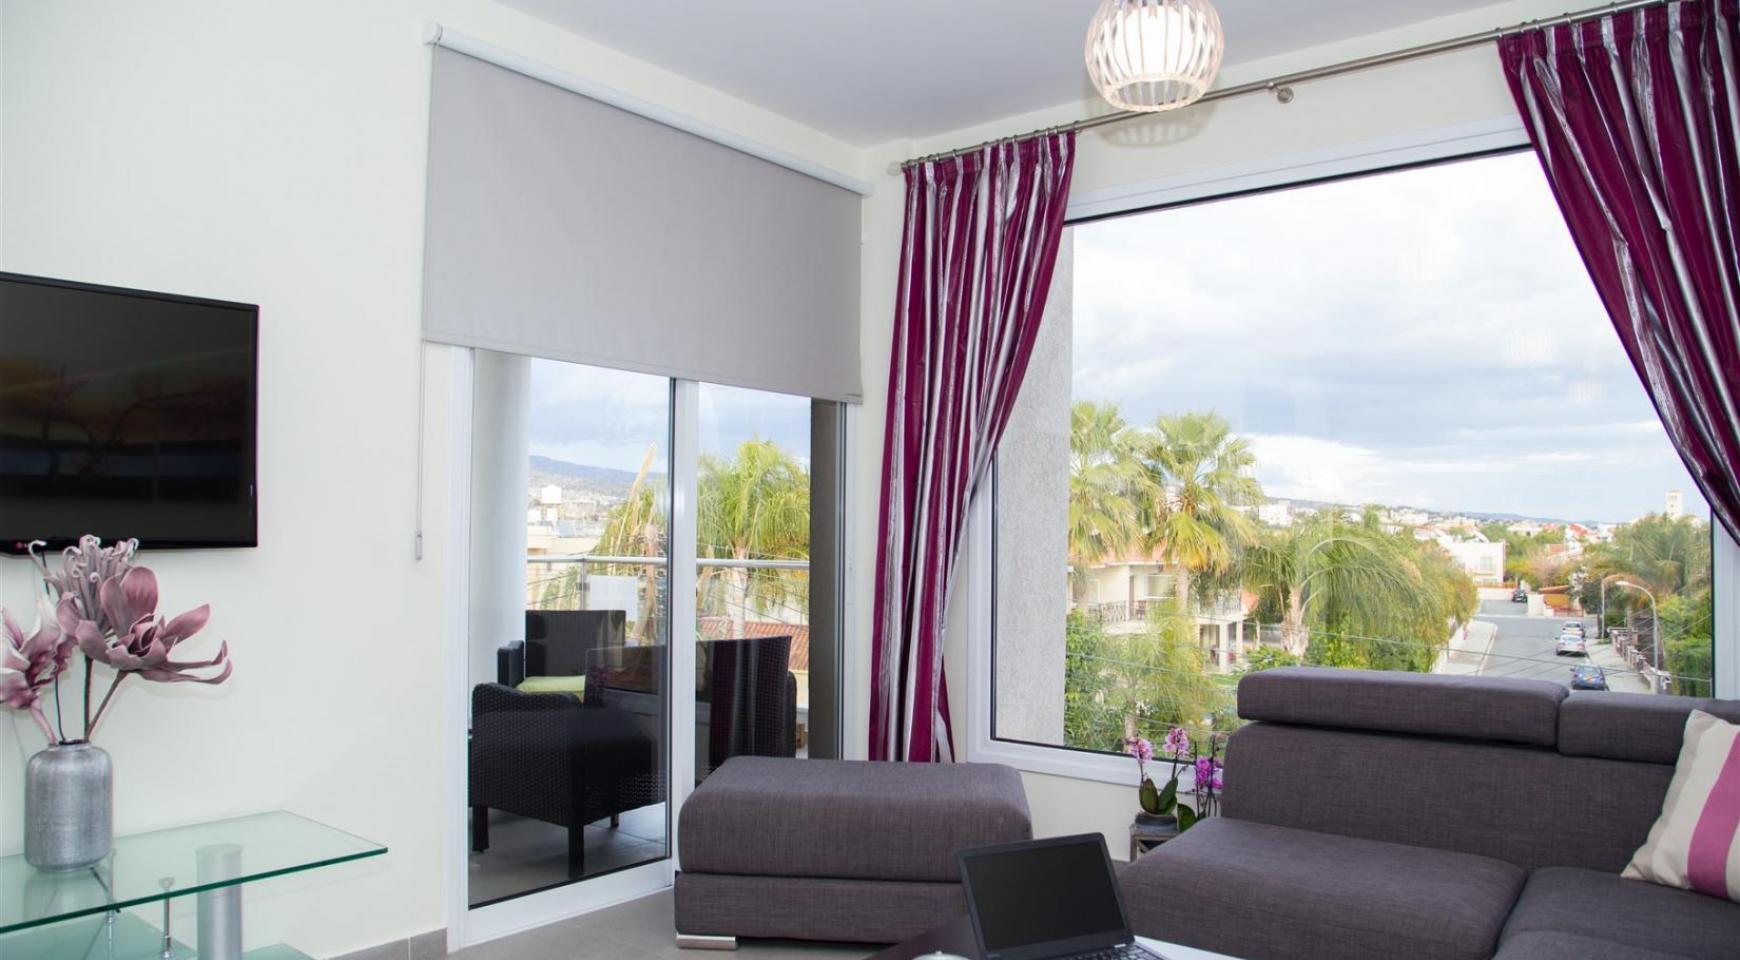 Luxury 2 Bedroom Apartment Christina 301 in the Tourist Area - 11